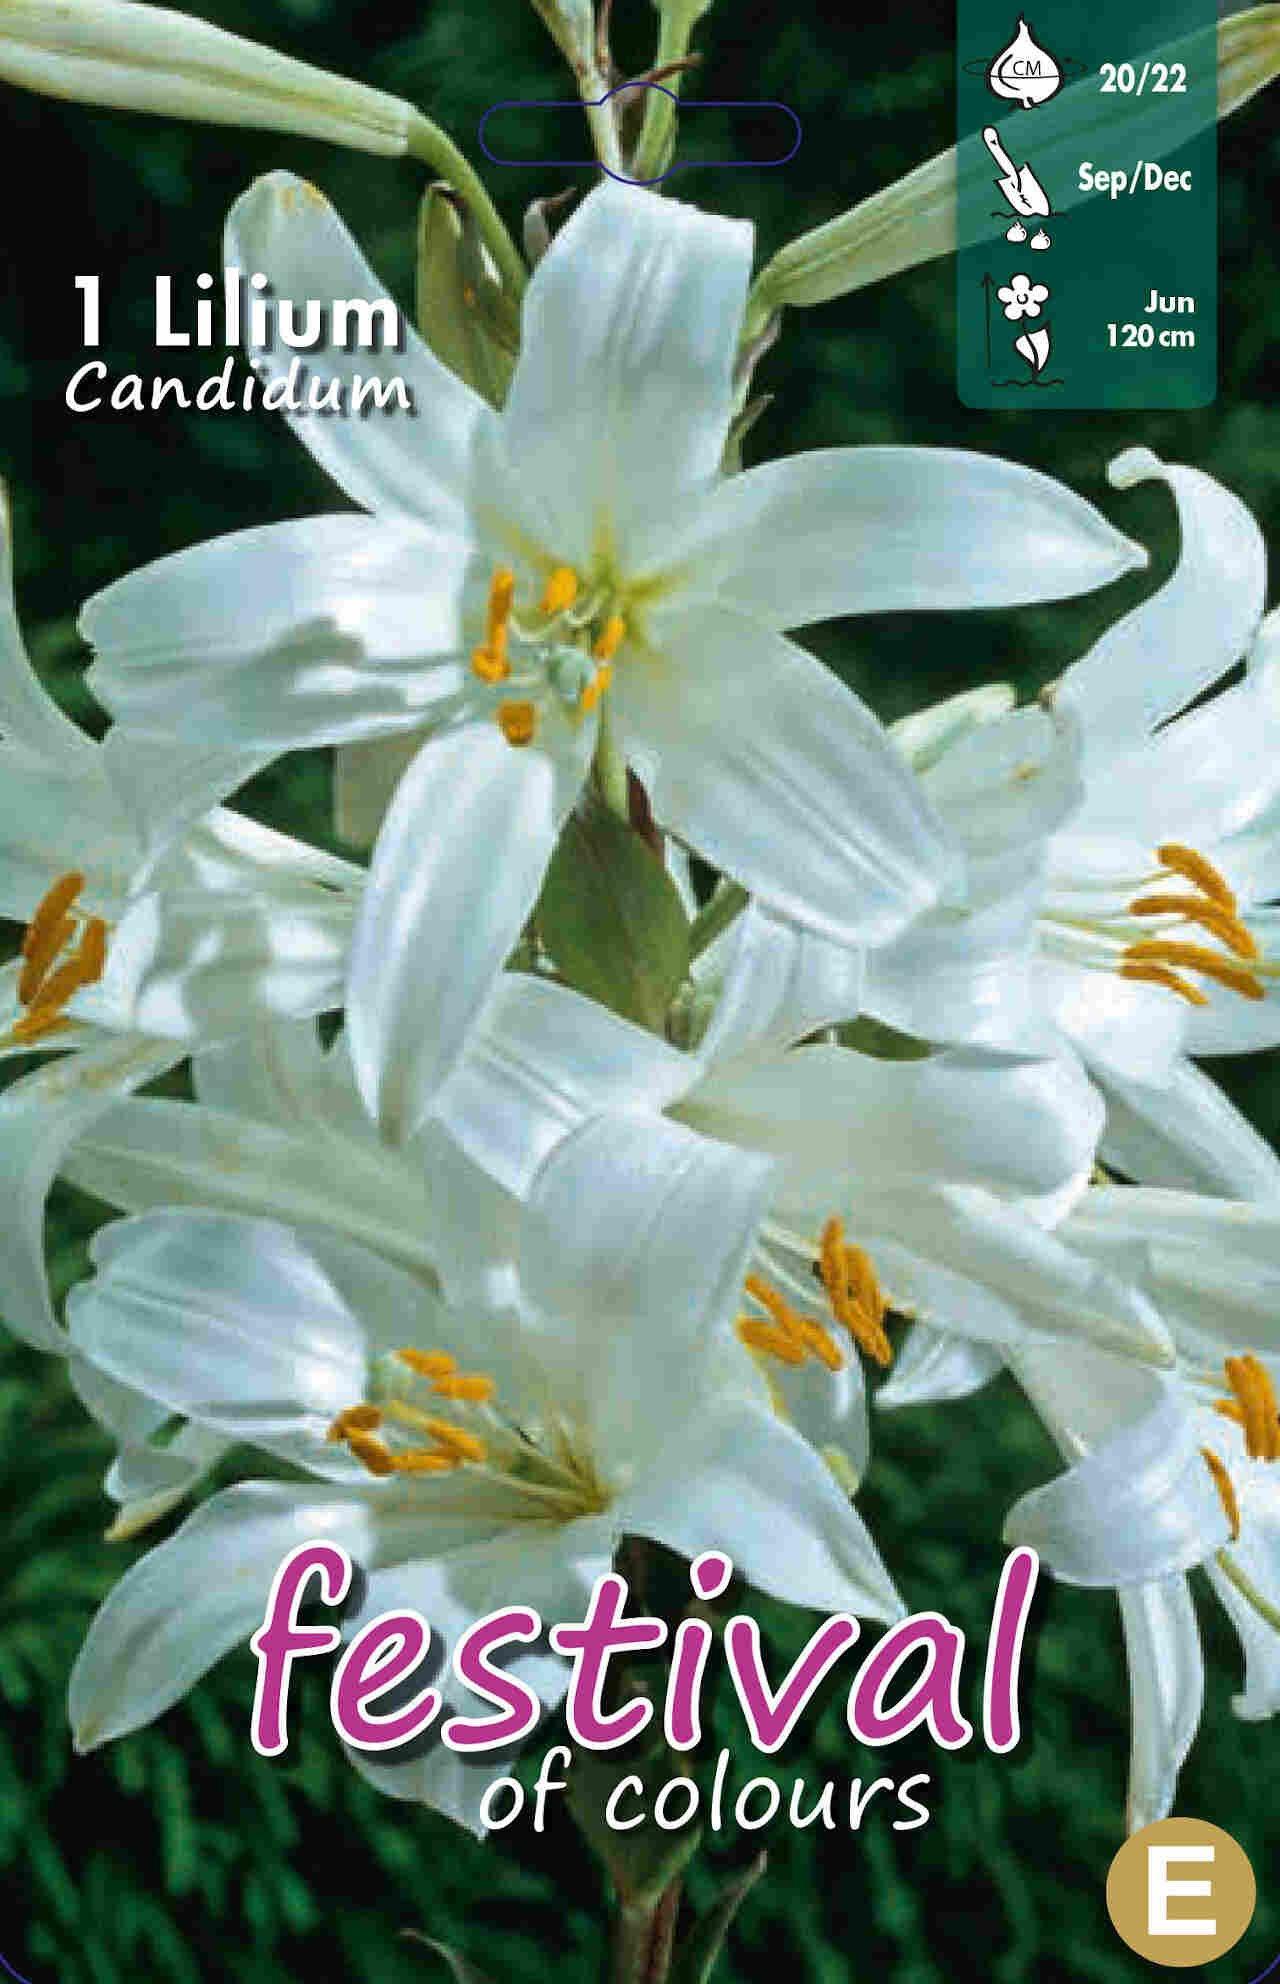 Madonnalilje - Lilium Candidum 20/22